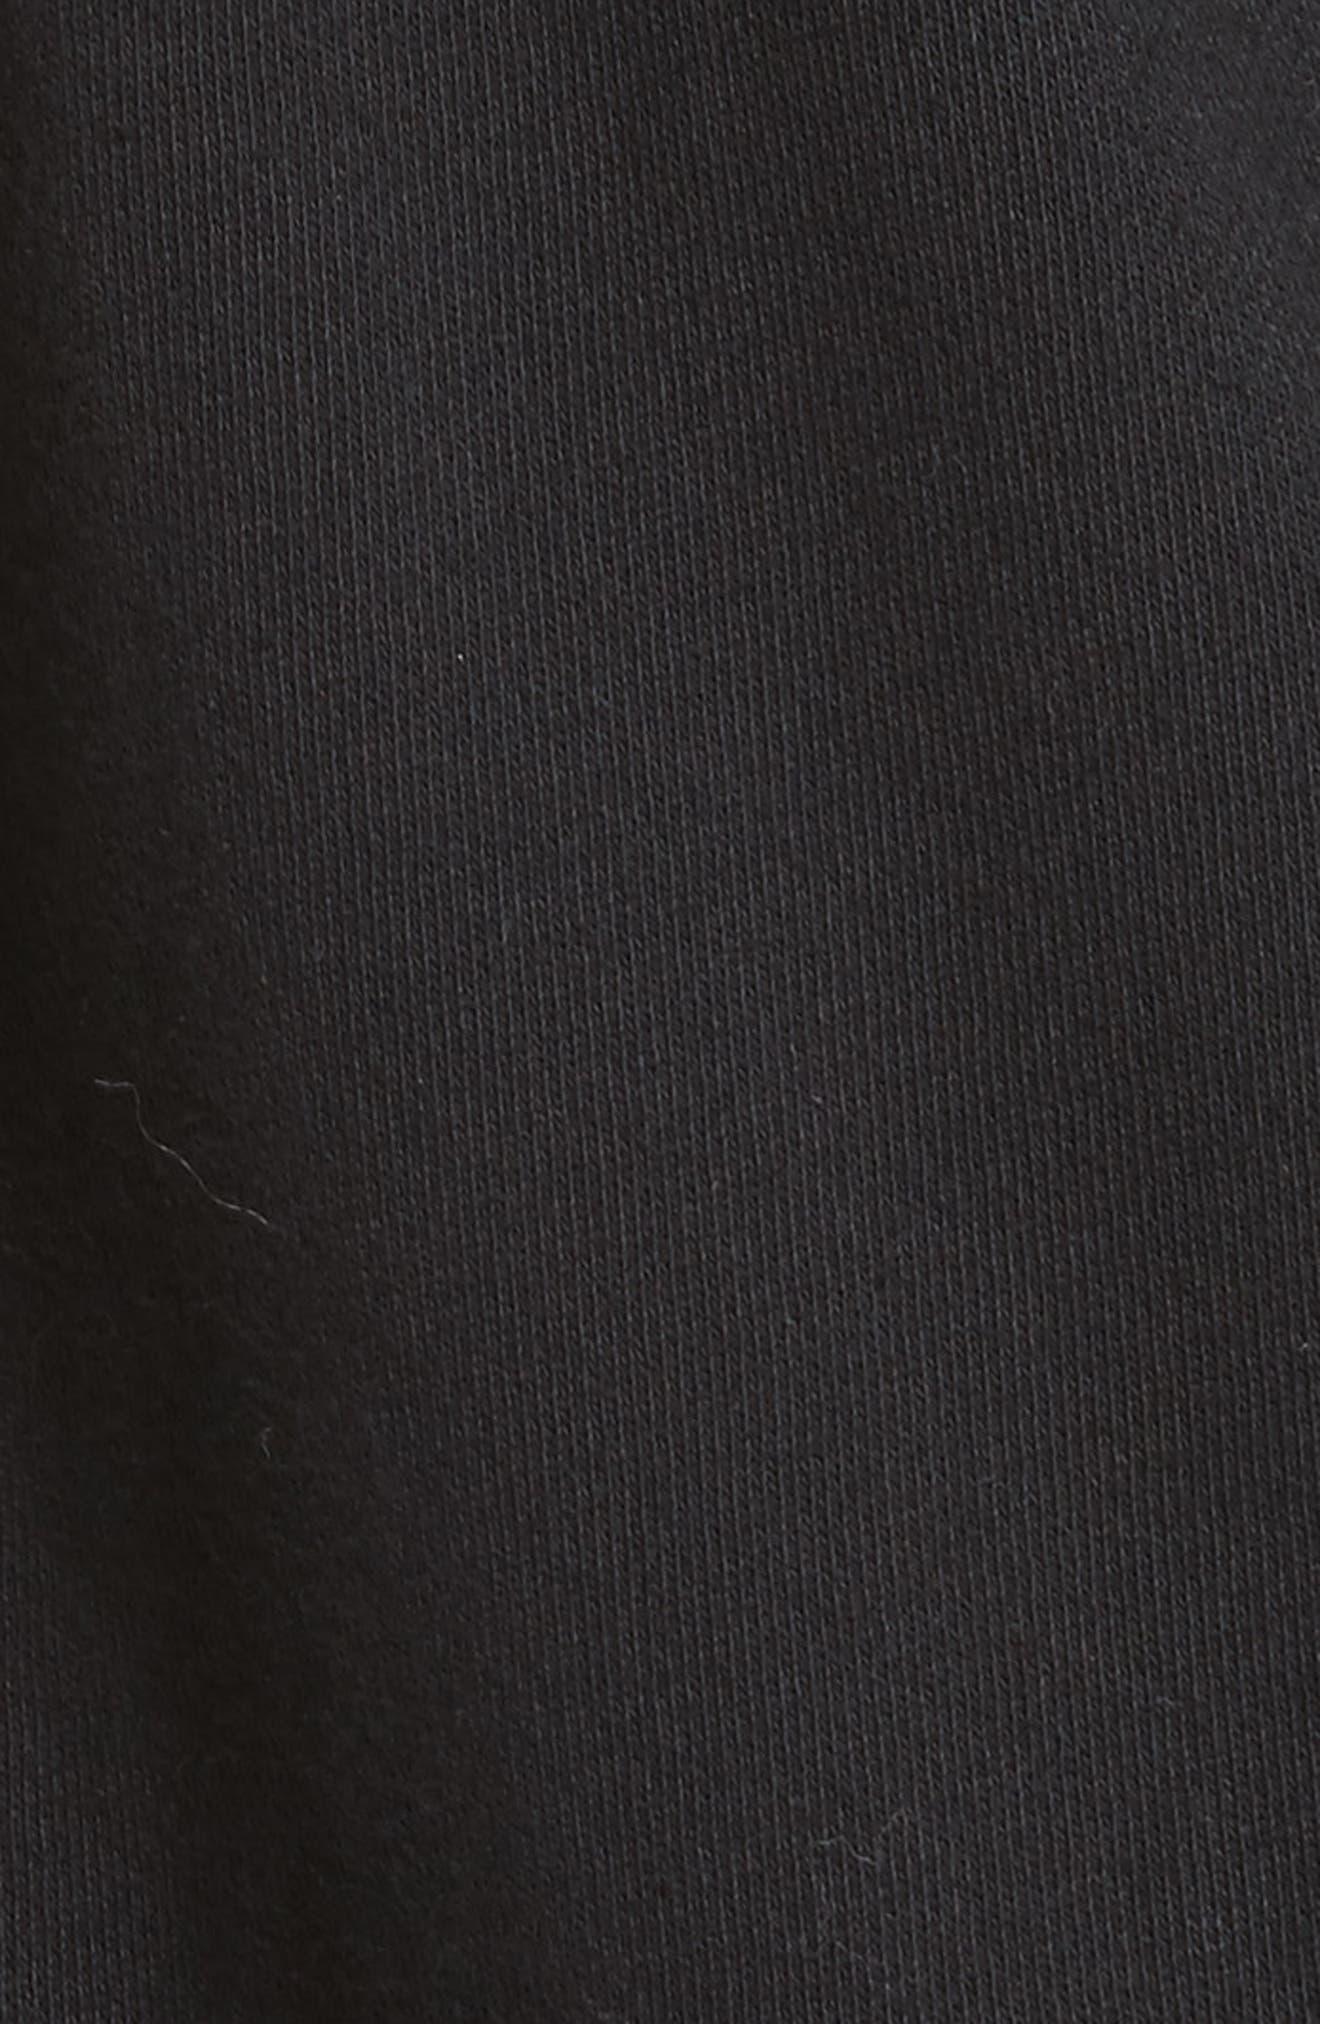 Westwood Cardigan,                             Alternate thumbnail 5, color,                             Black